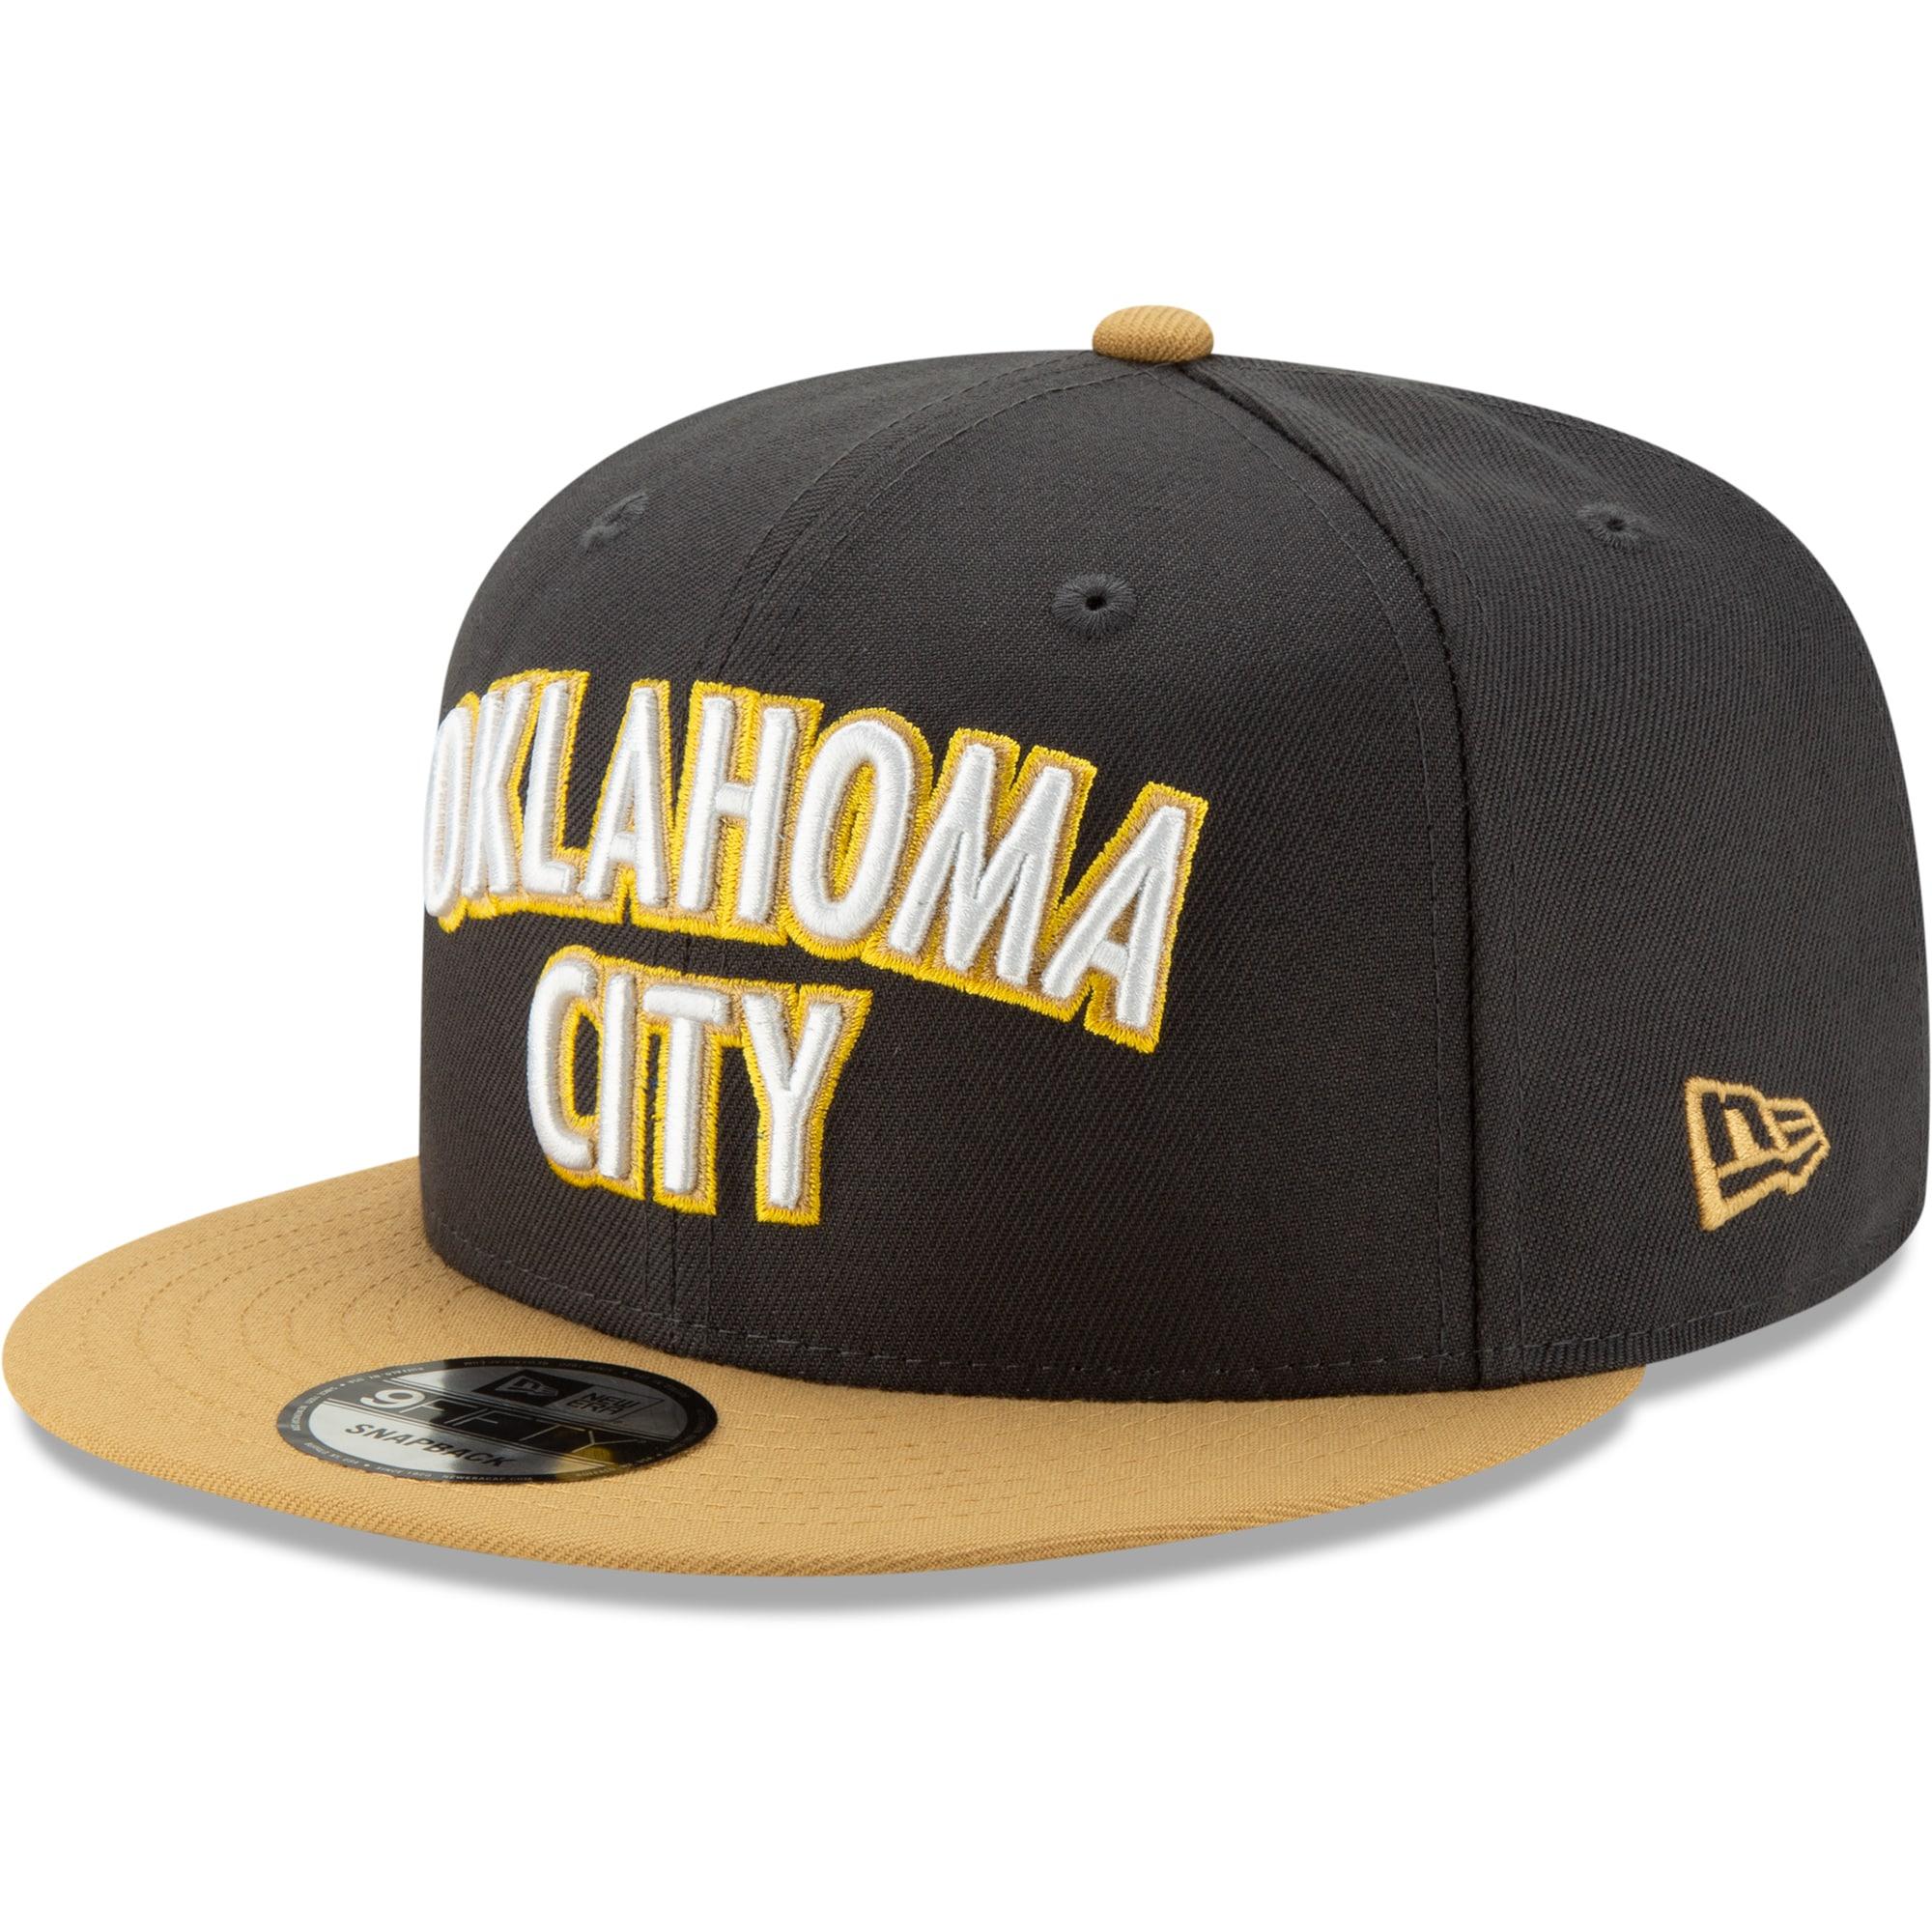 Oklahoma City Thunder New Era 2019/20 City Edition On Court 9FIFTY Snapback Adjustable Hat - Black/Gold